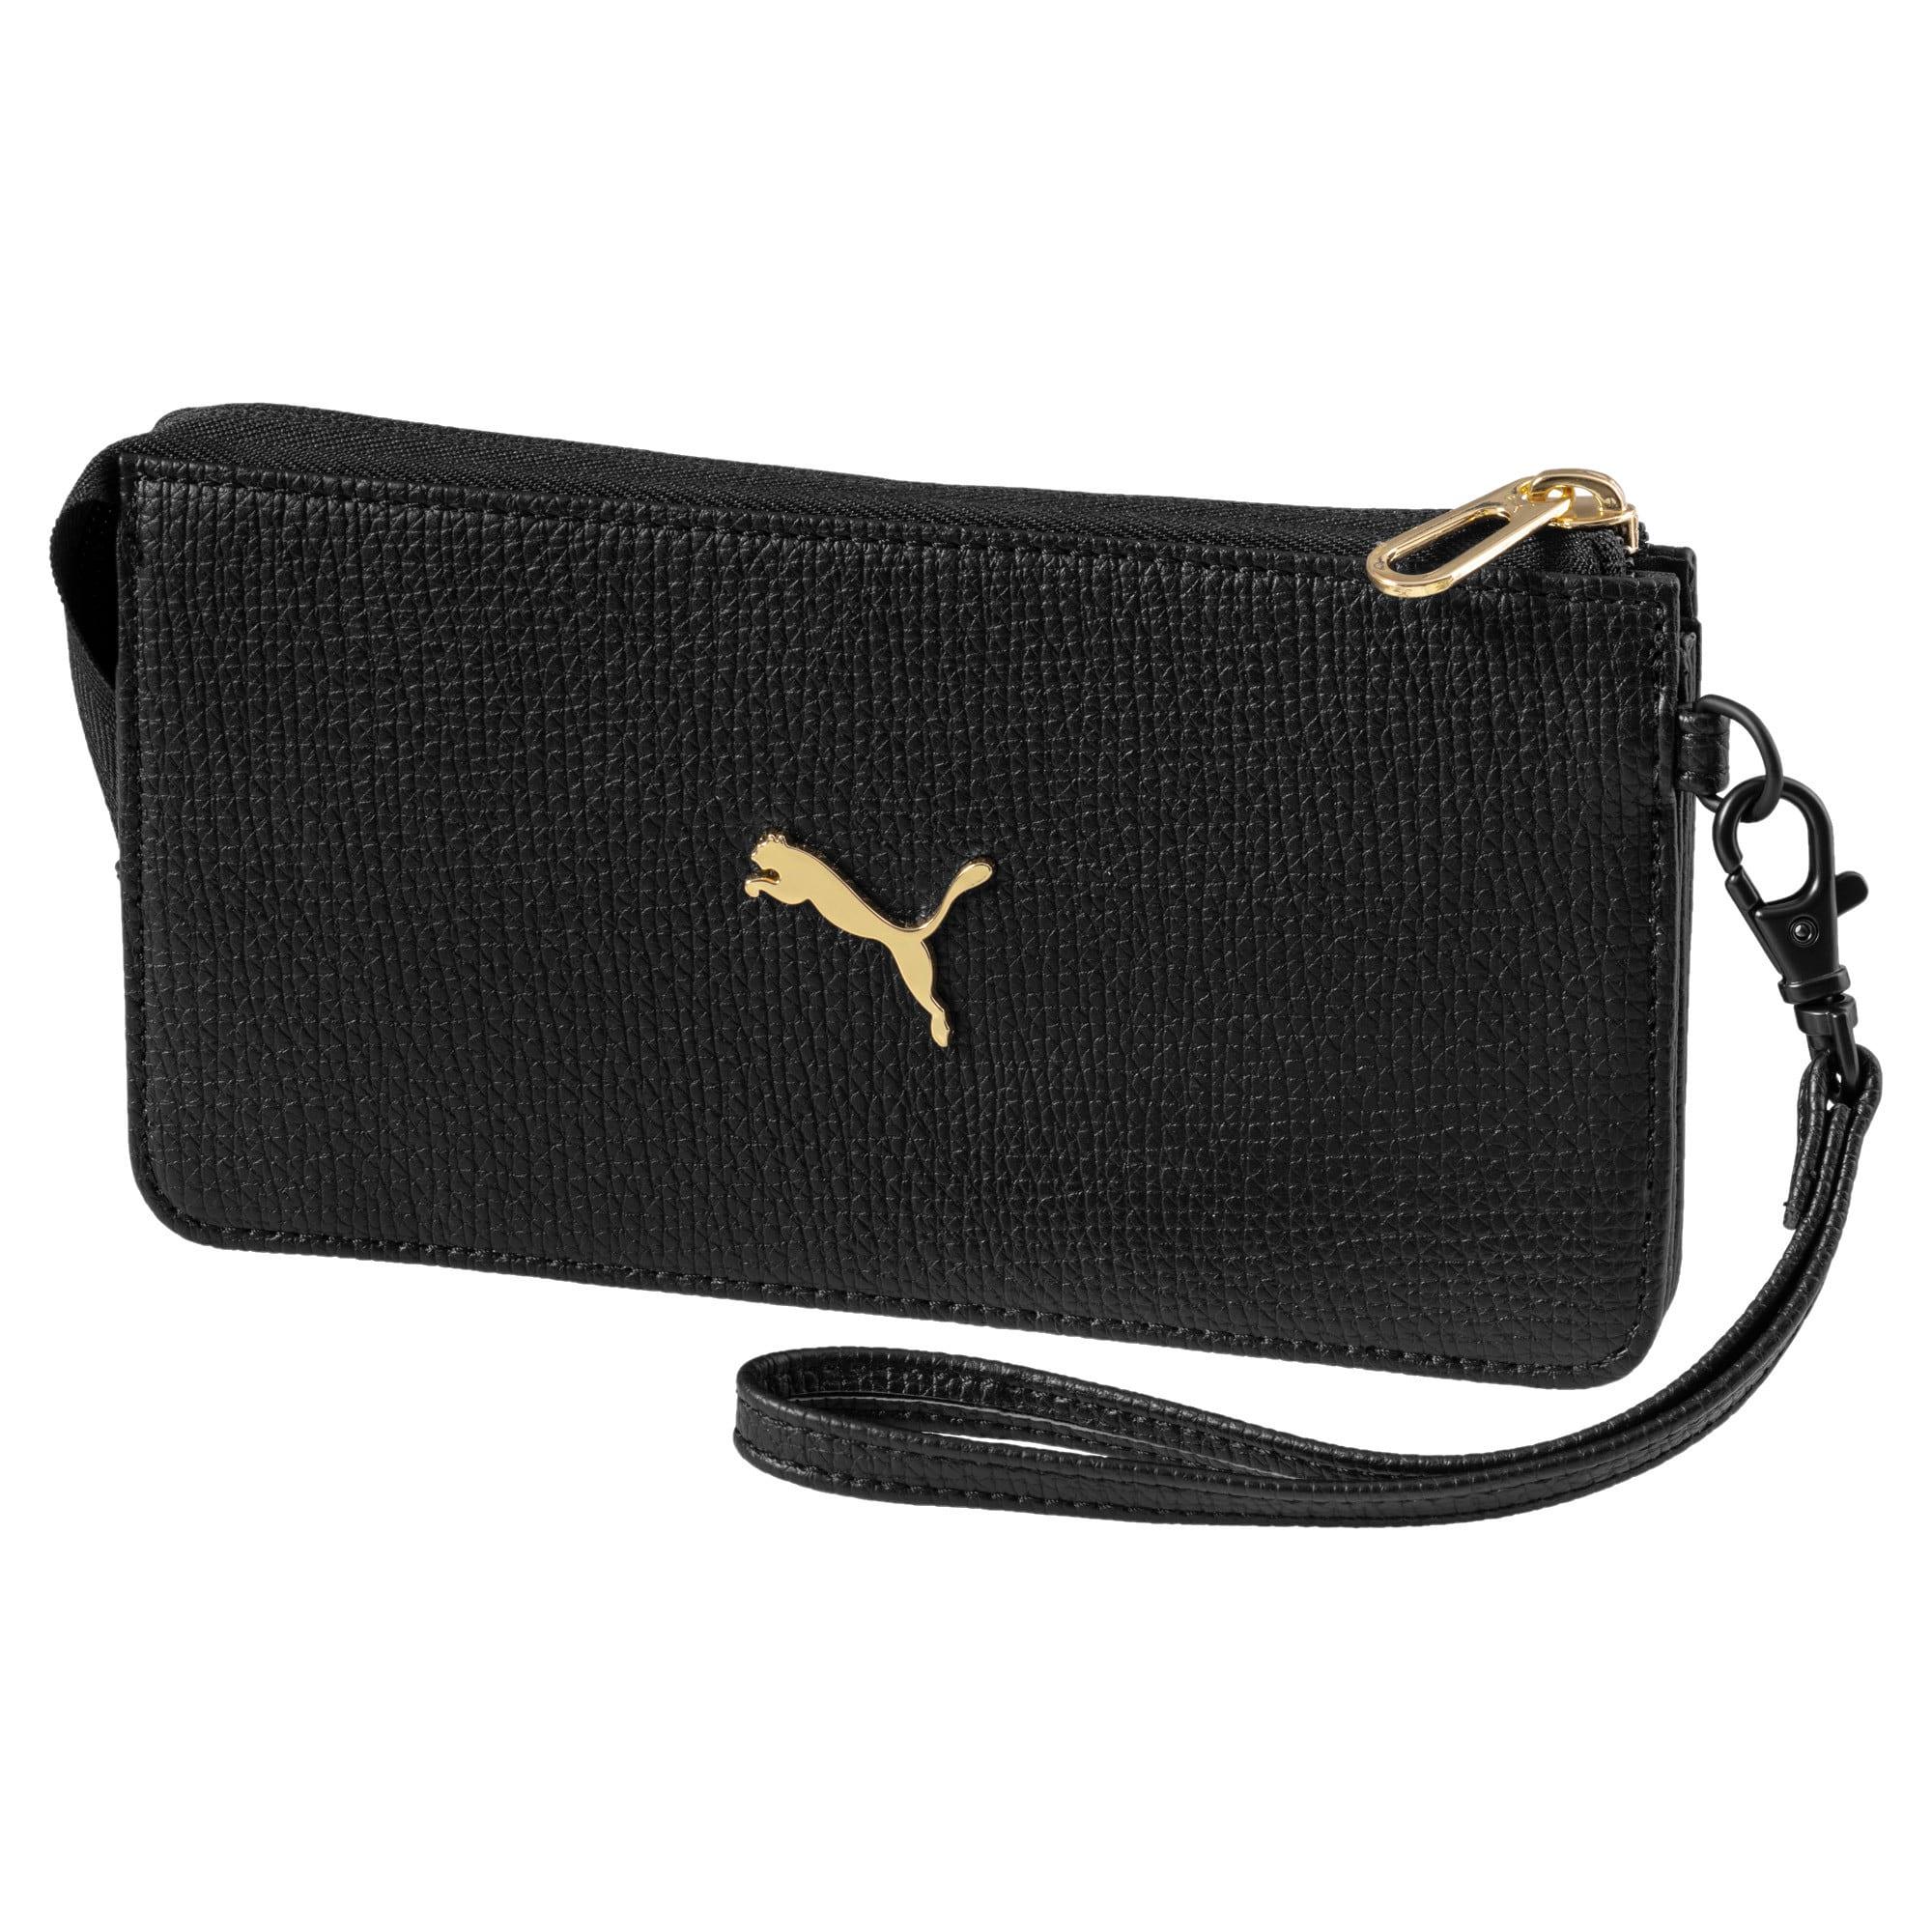 Thumbnail 2 of Ferrari Lifestyle Women's Wallet, Puma Black, medium-IND